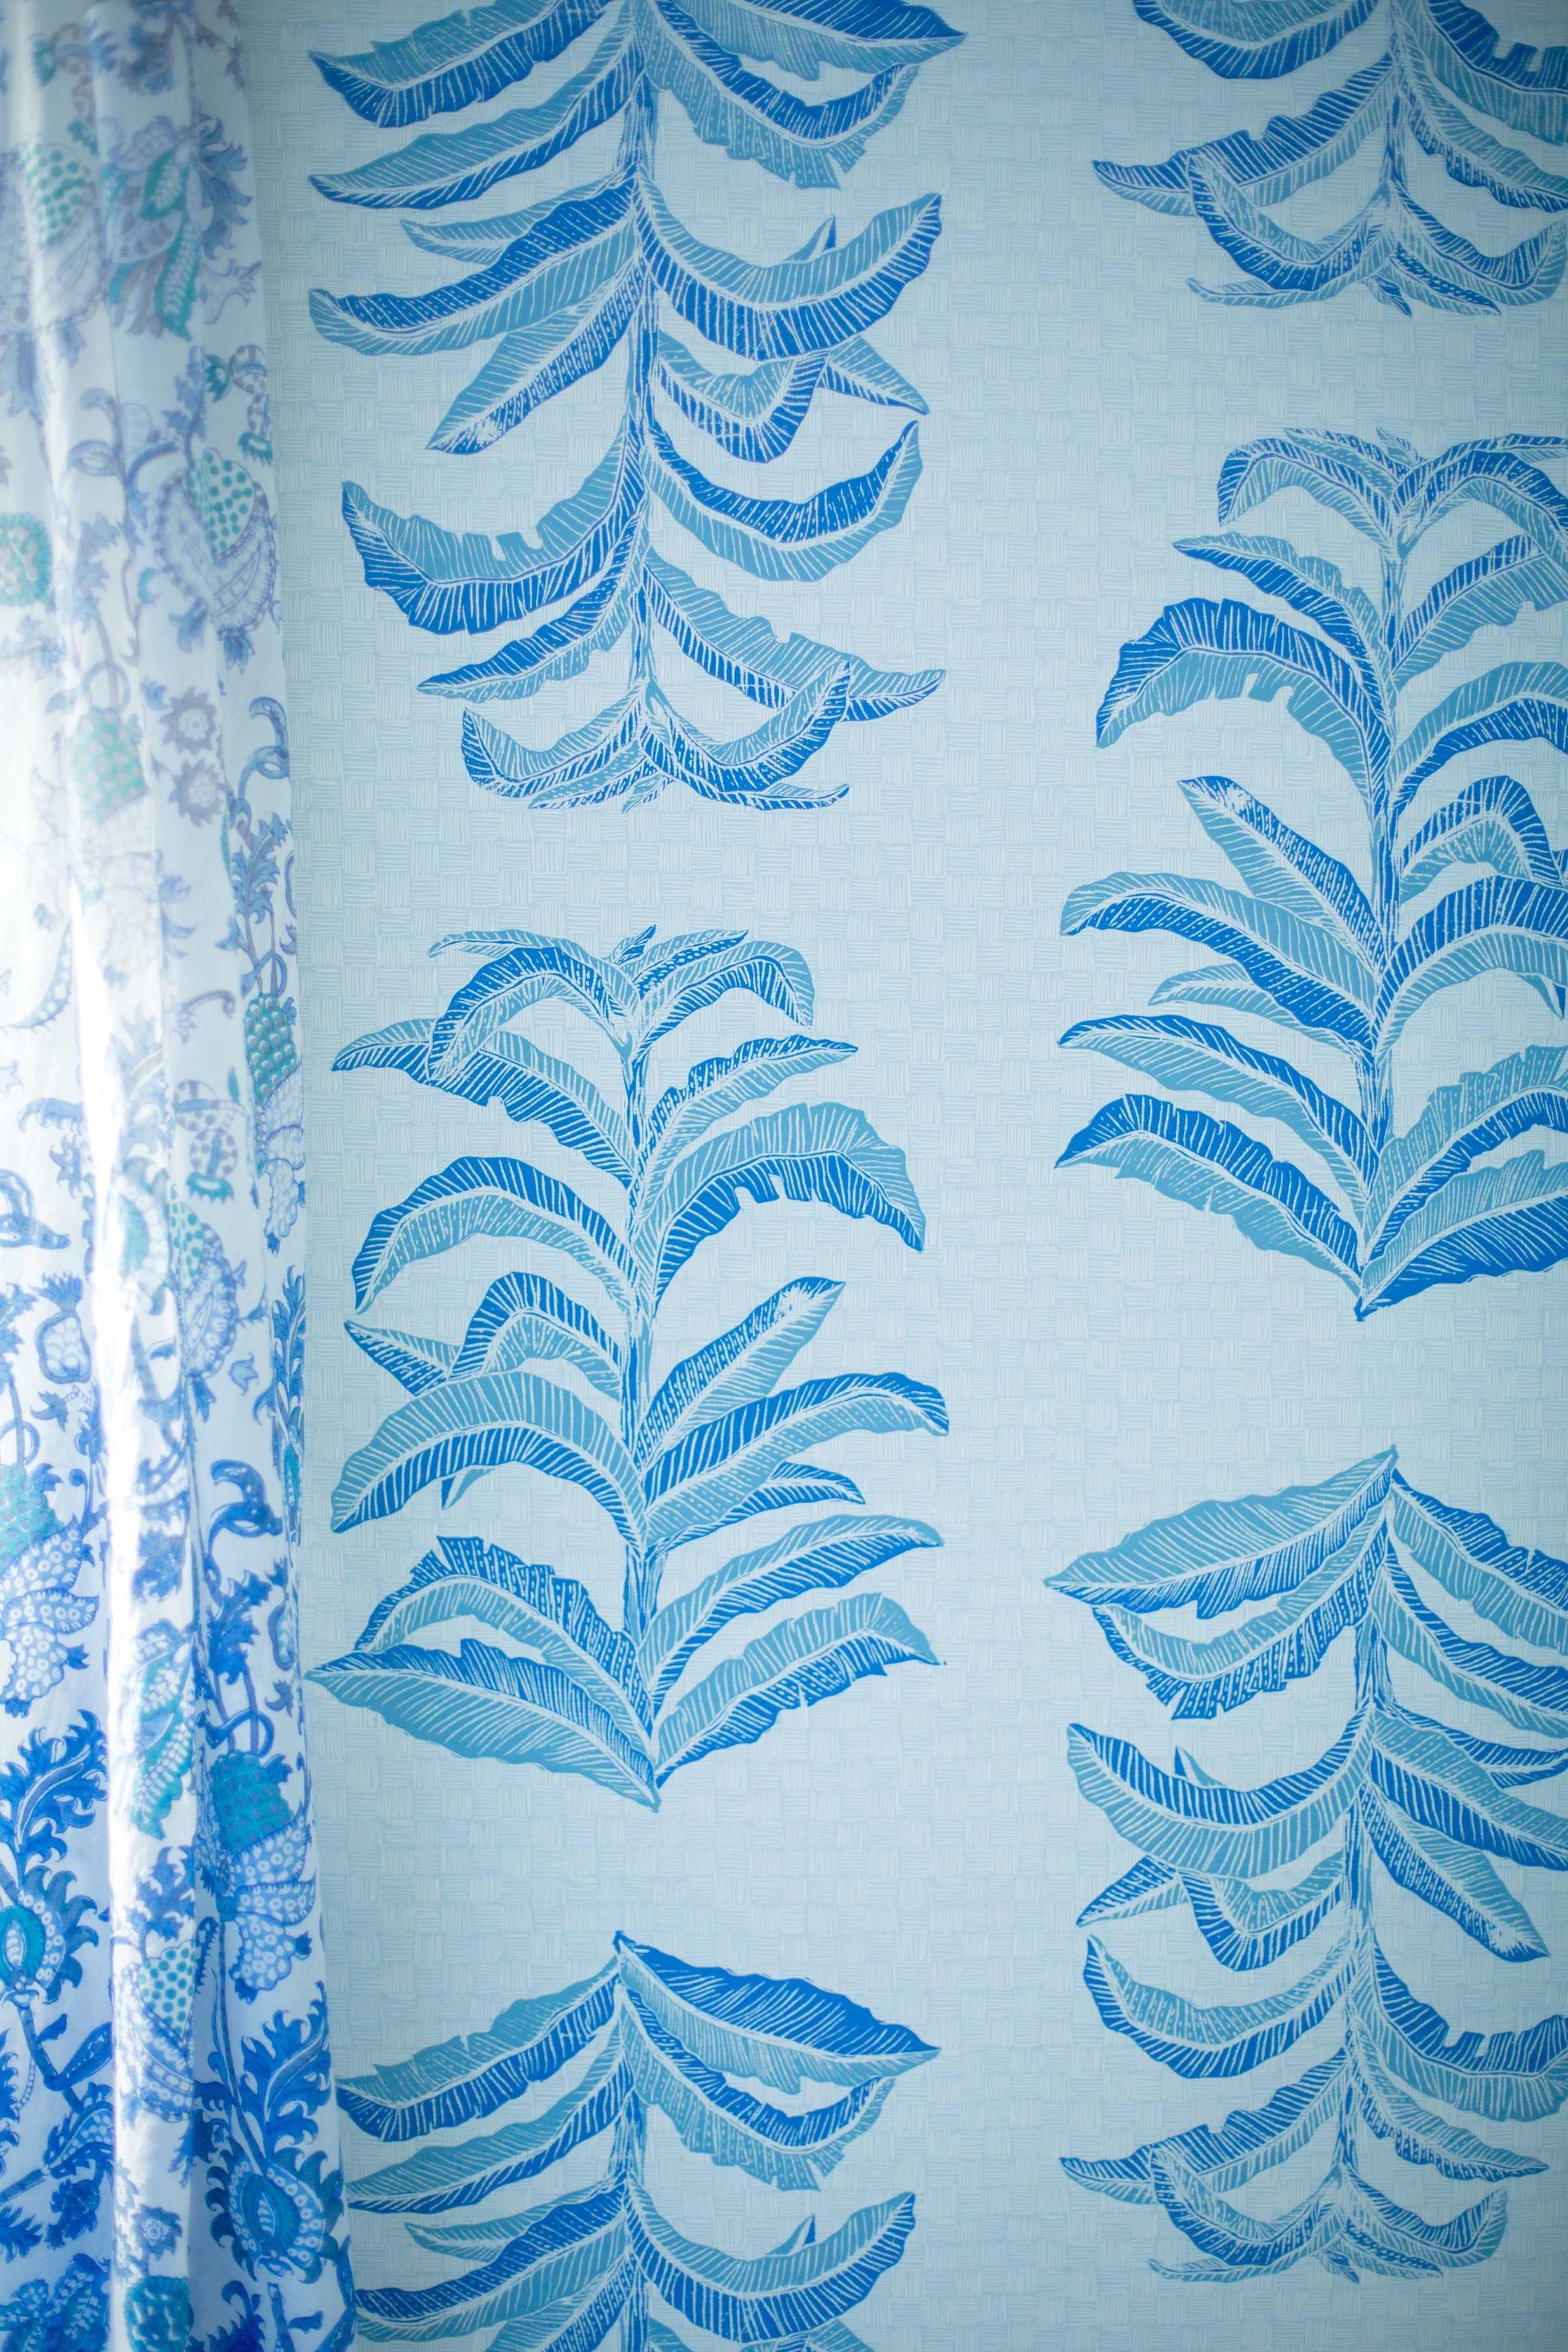 Banana Leaf Wallpaper in Sapphire, Photo by Benjamin Hoffman